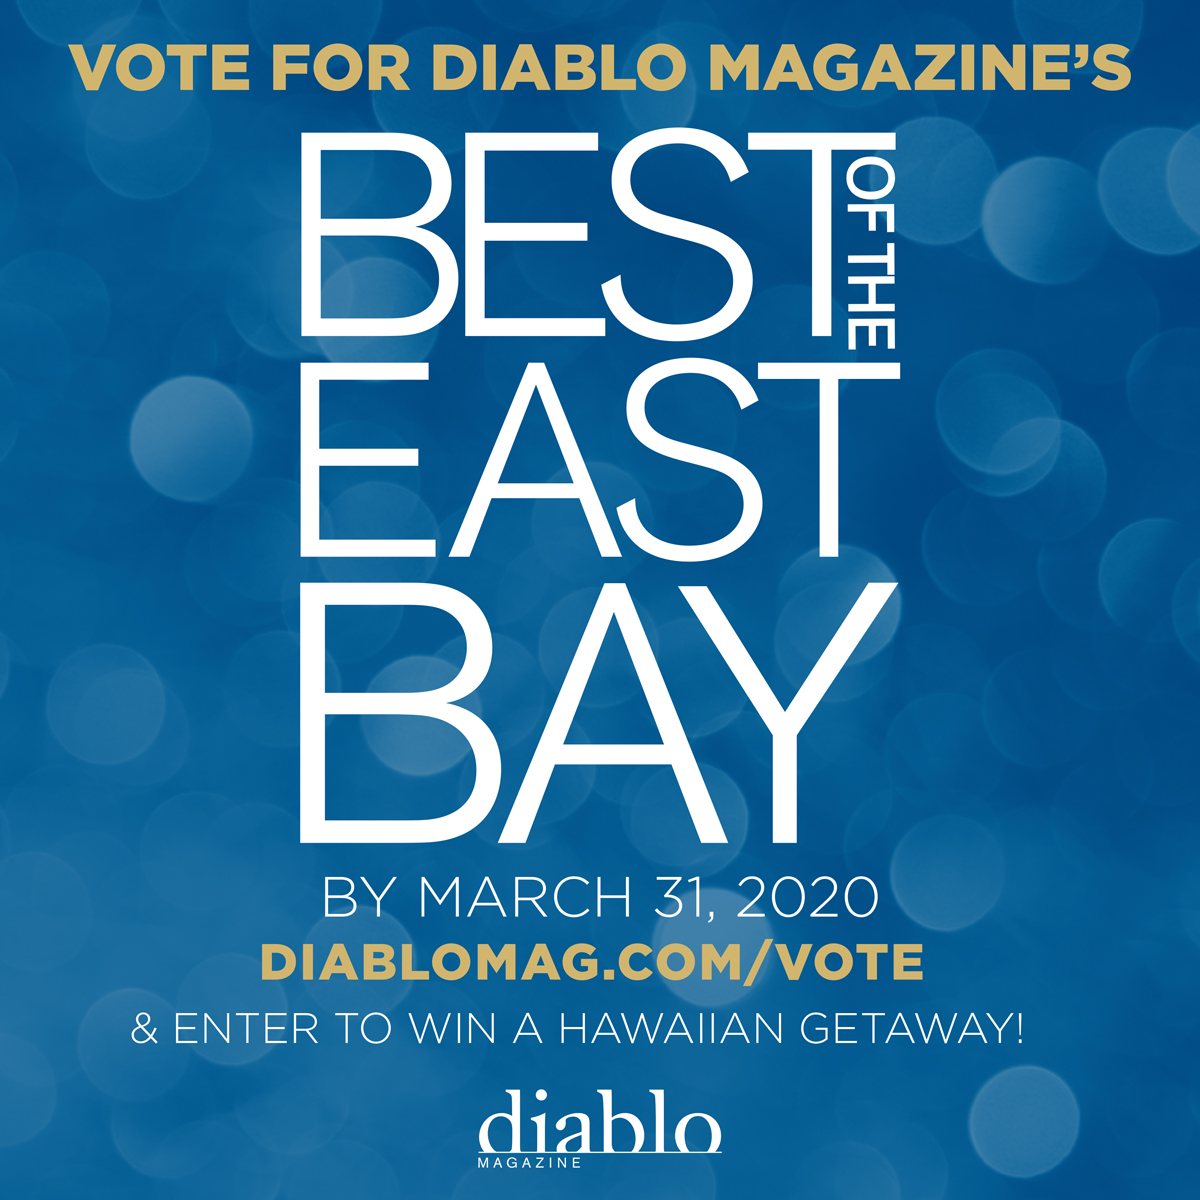 Diablo magazine's Best of the East Bay 2020